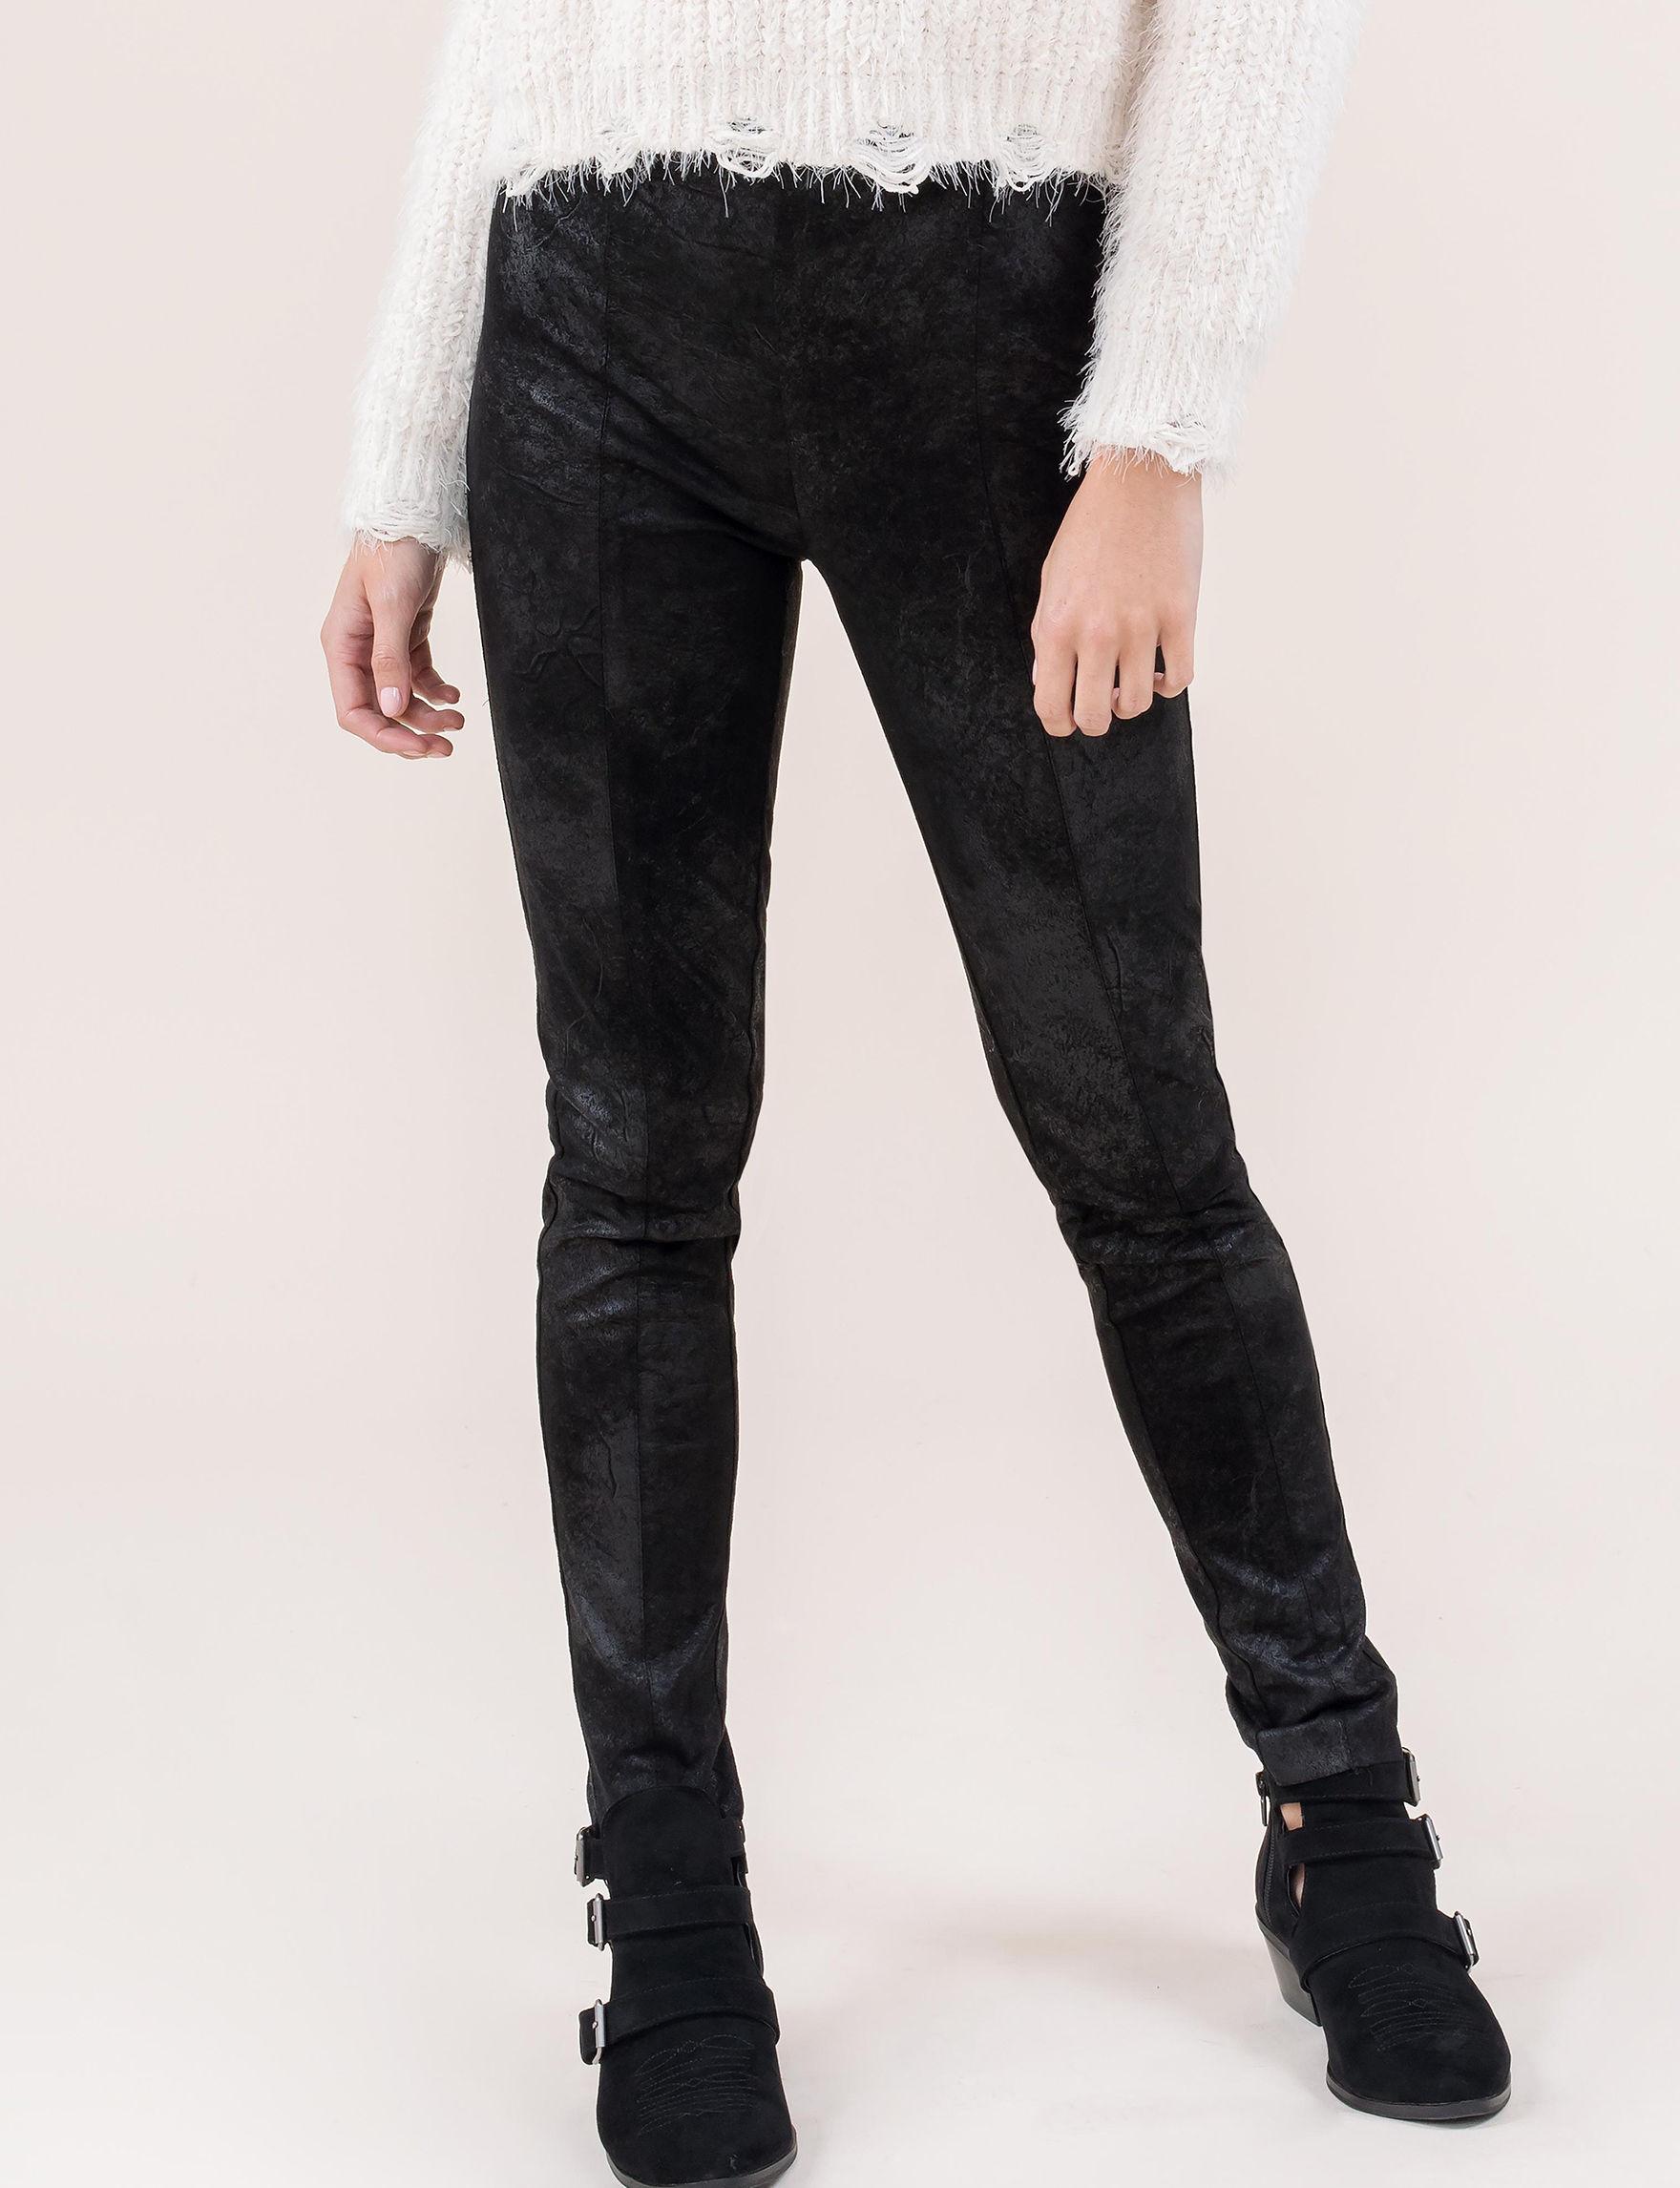 C + J Collections Black Leggings Skinny